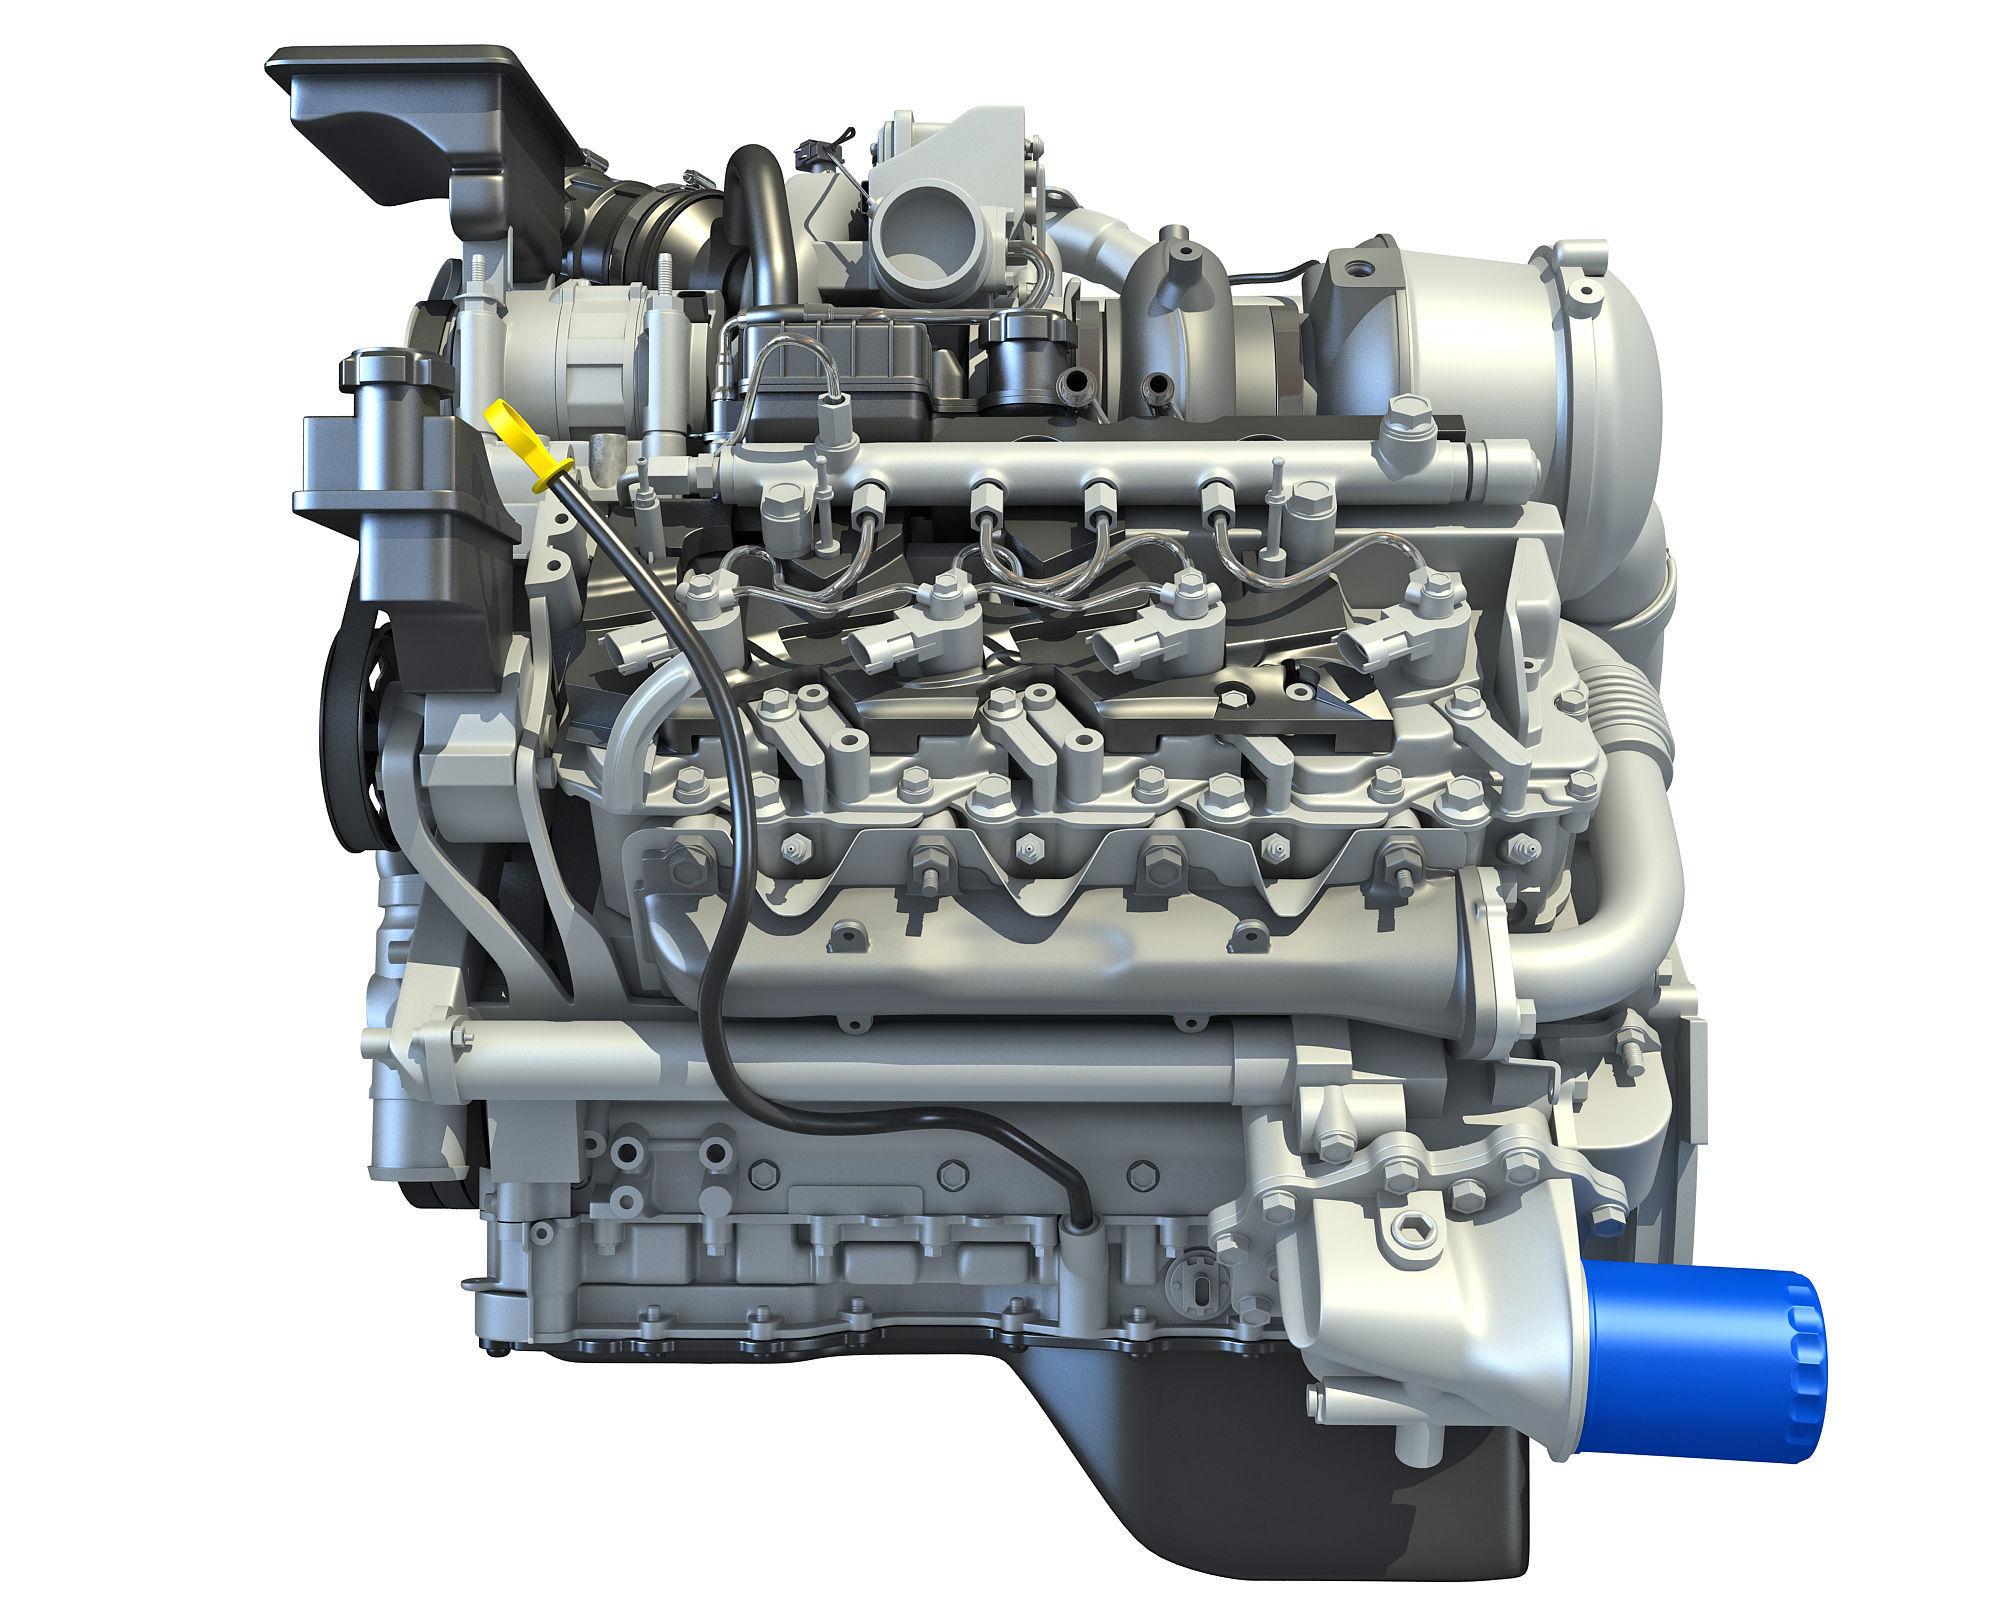 V8 Turbo Engine Models